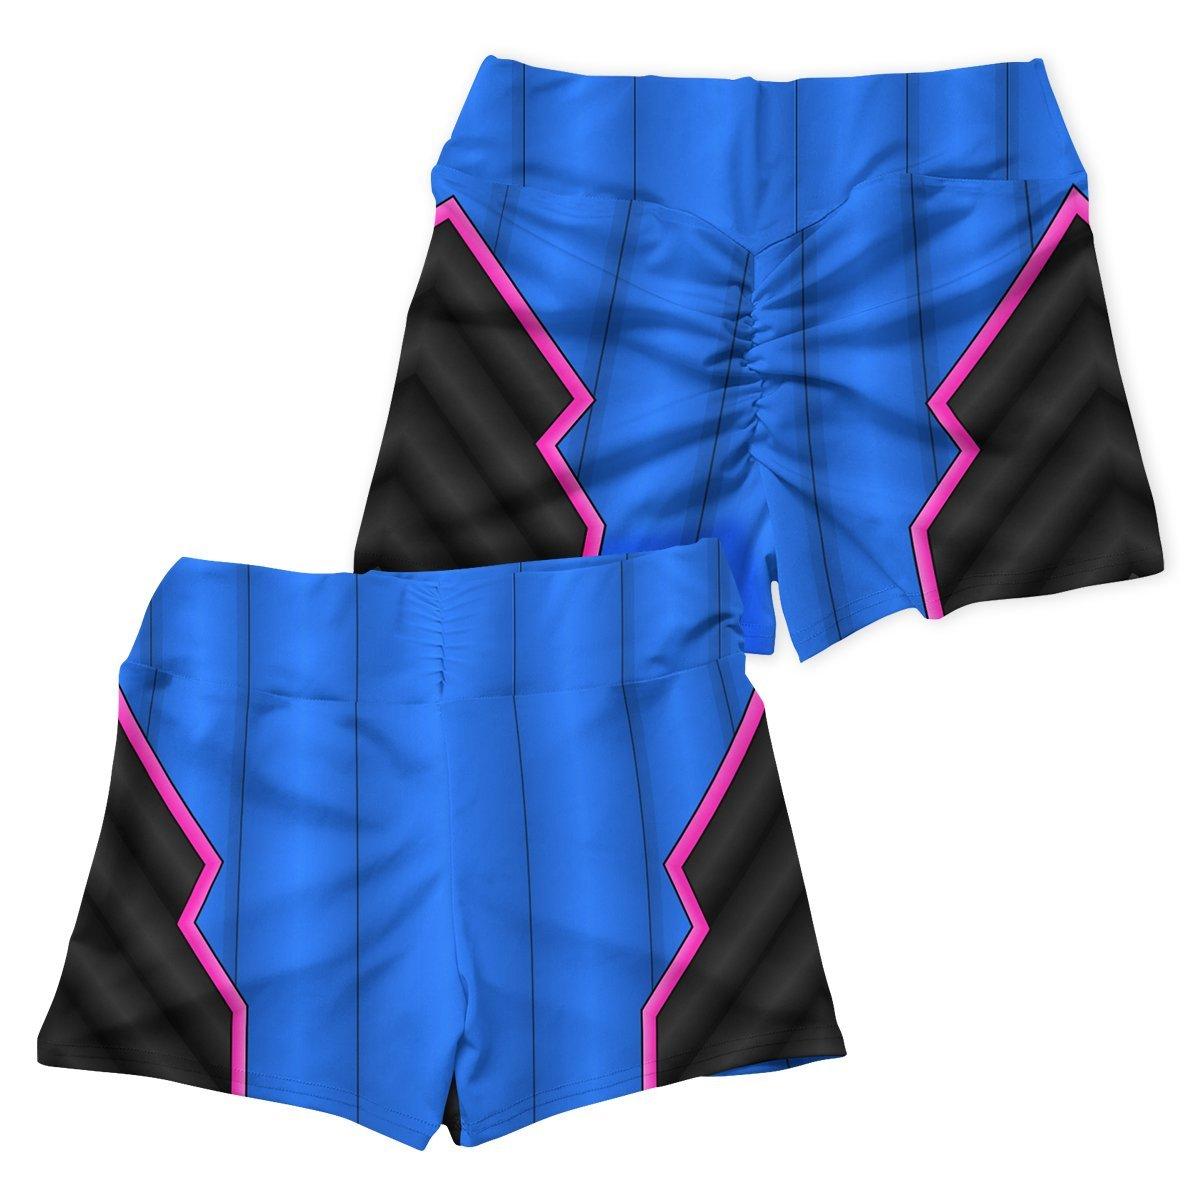 dva summer active wear set 453923 - Anime Swimsuits